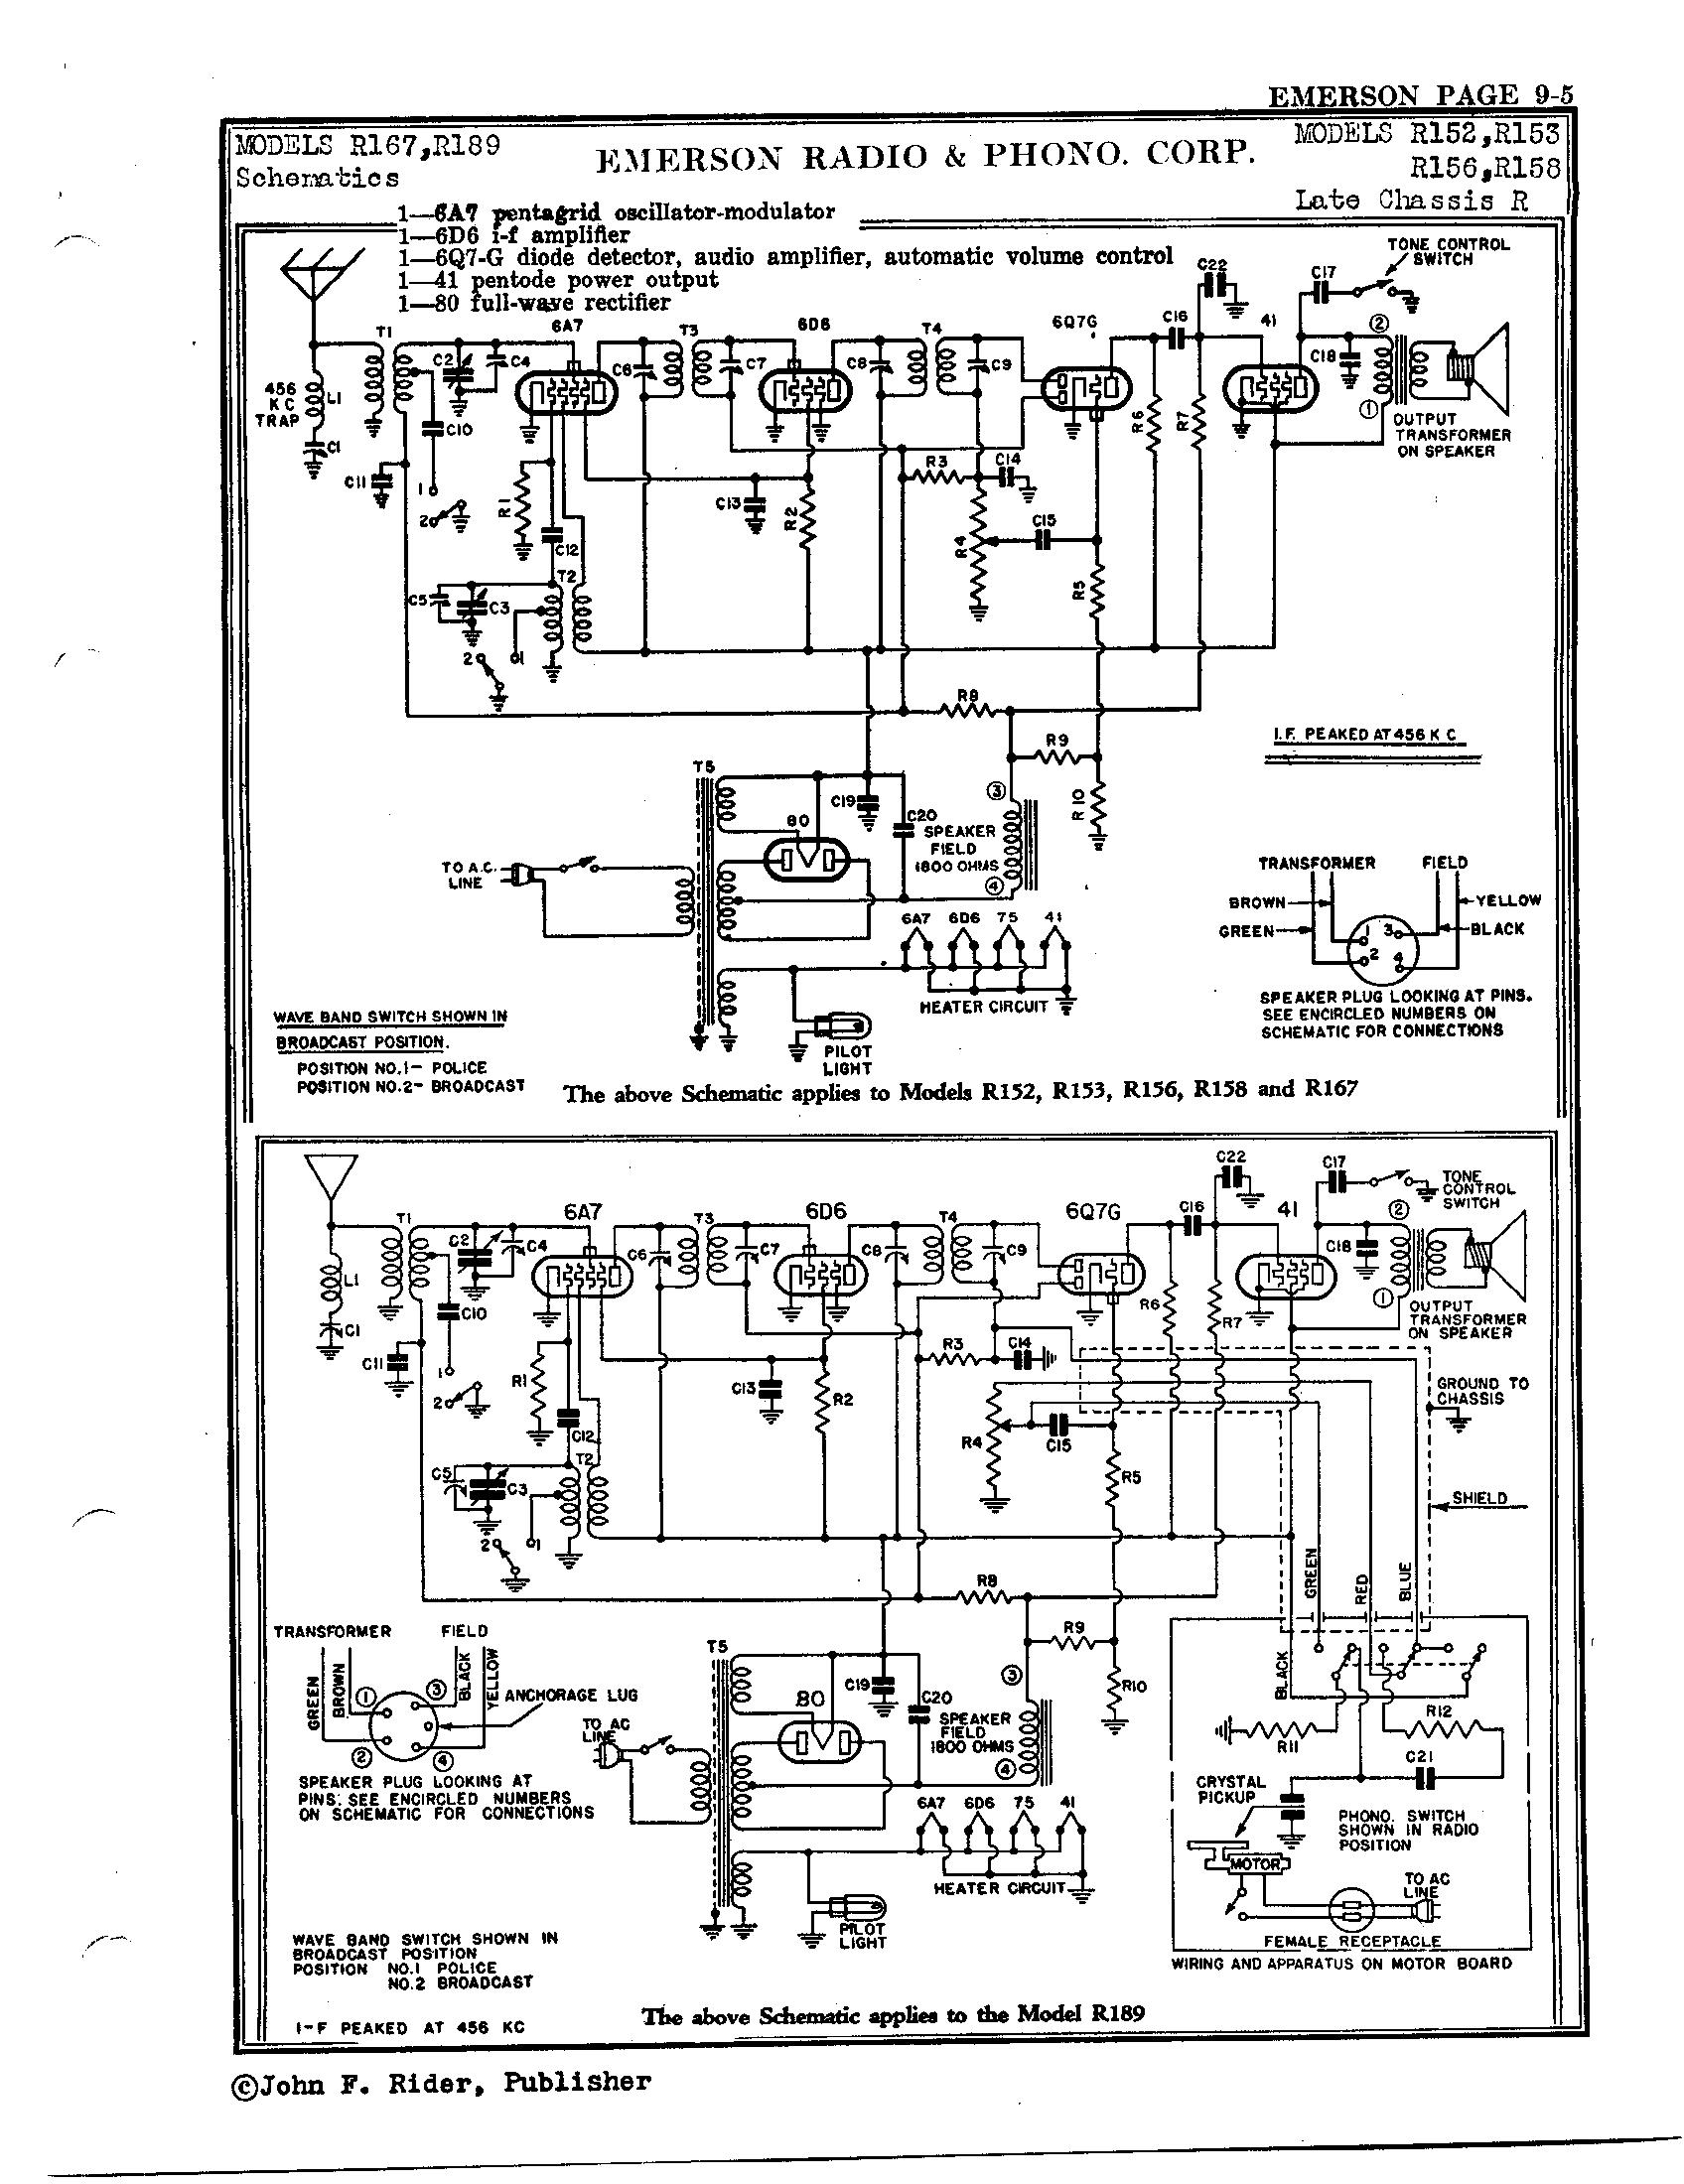 Emerson Radio Amp Phonograph Corp R156